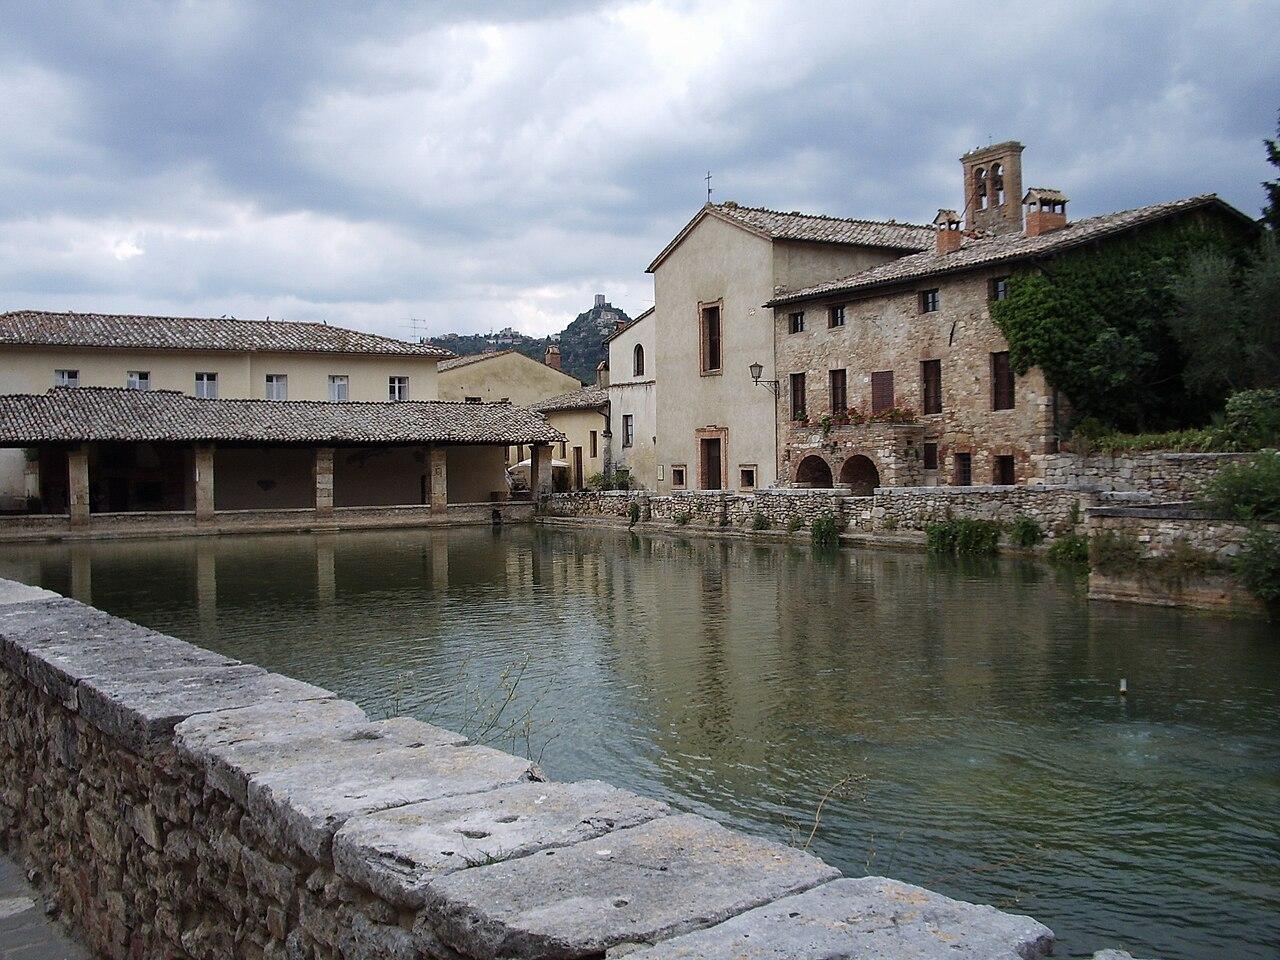 File:Bagno Vignoni.jpg - Wikimedia Commons